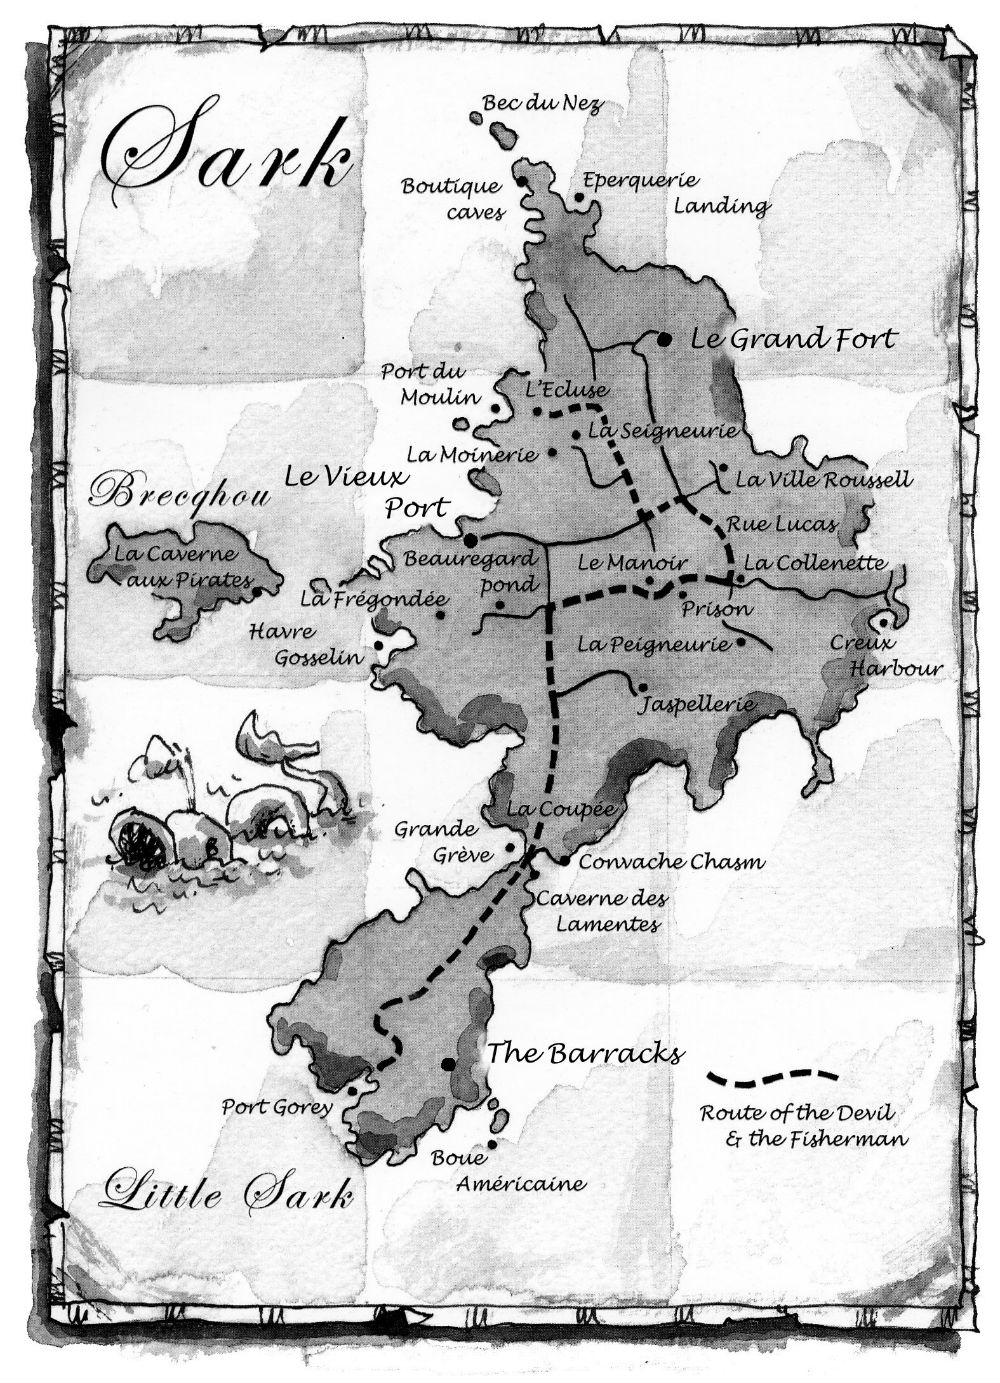 sark Map.jpg